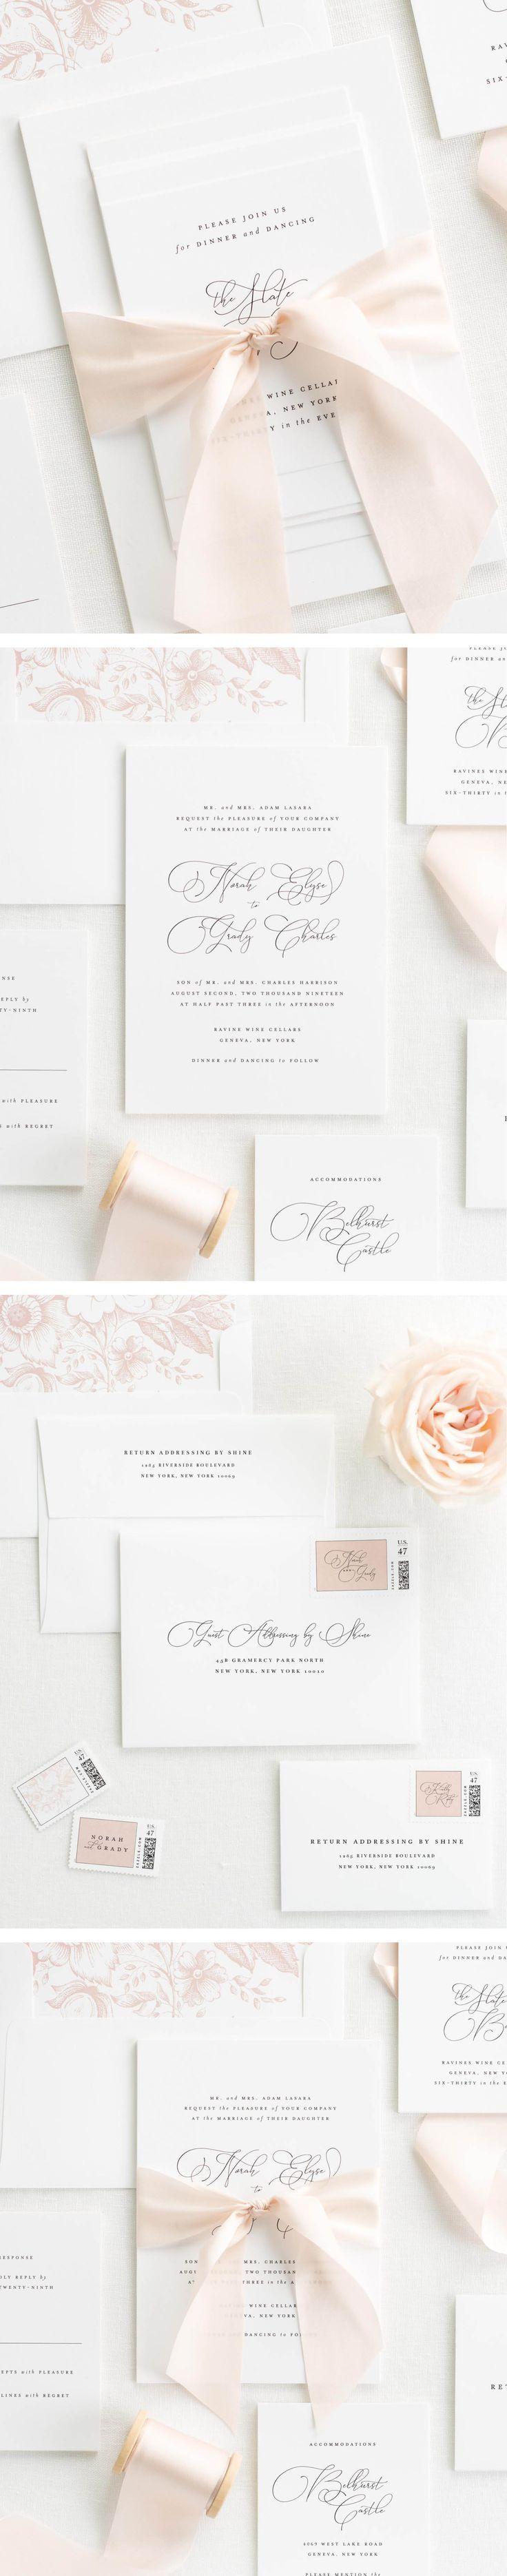 342 Best 2018 Wedding Invitations Shine Wedding Invitations Images